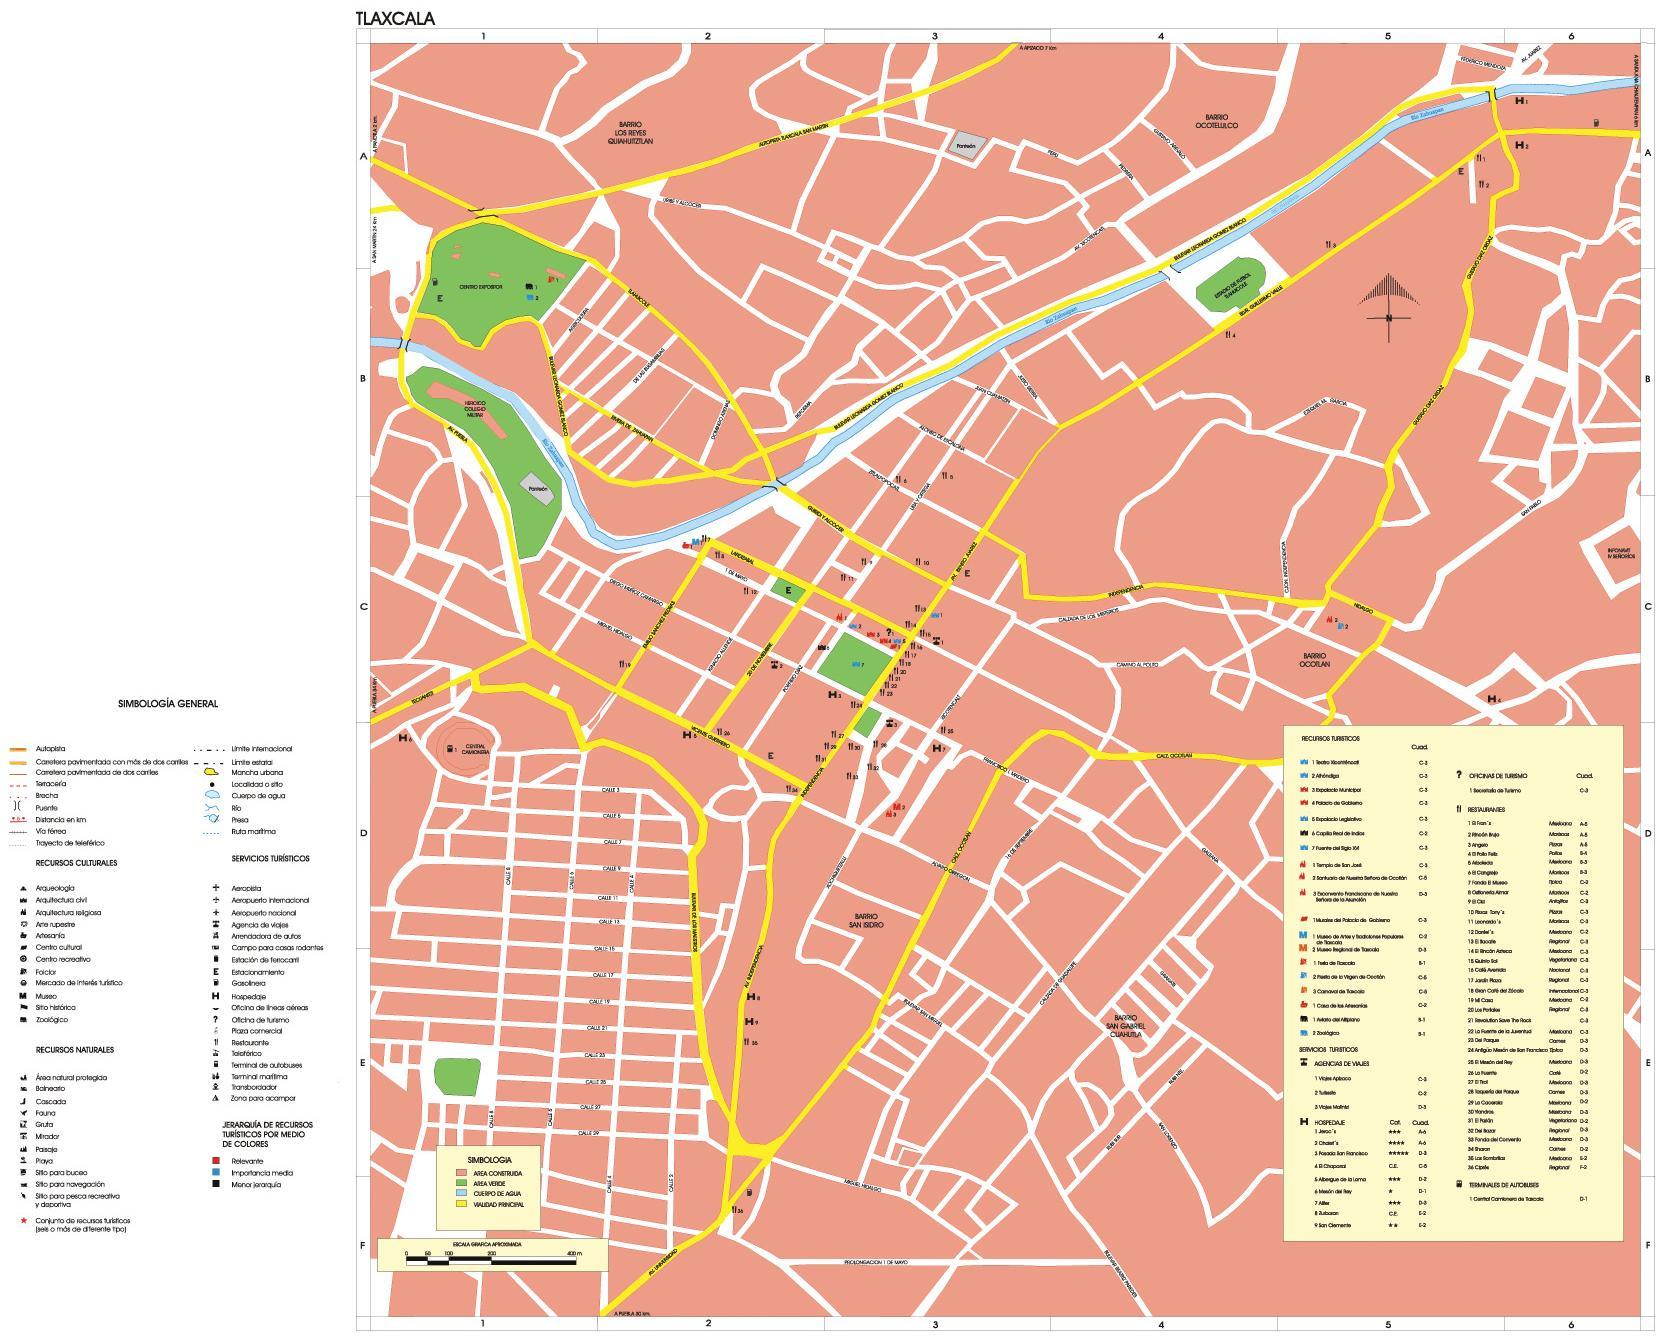 Mapa Tlaxcala, Tlaxcala, Mexico